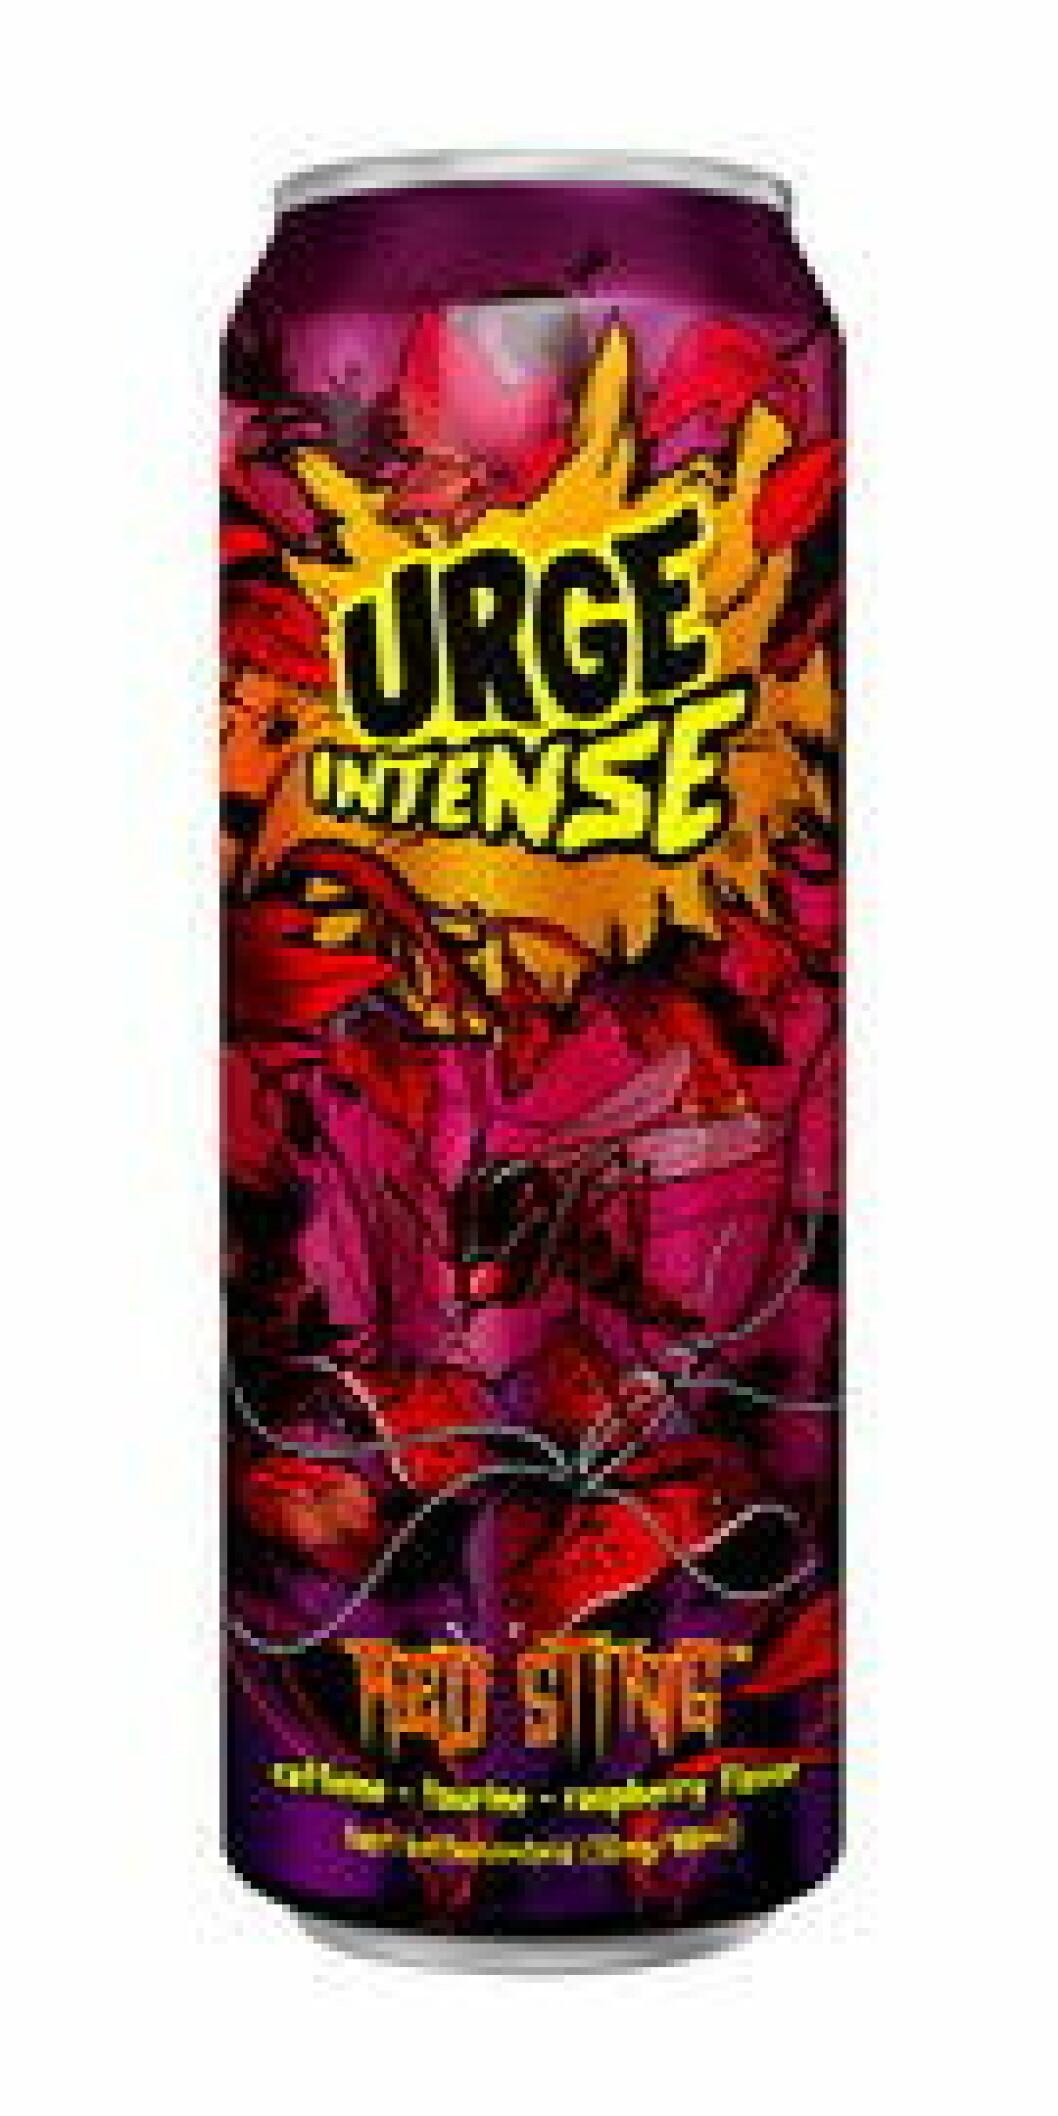 Urge intense